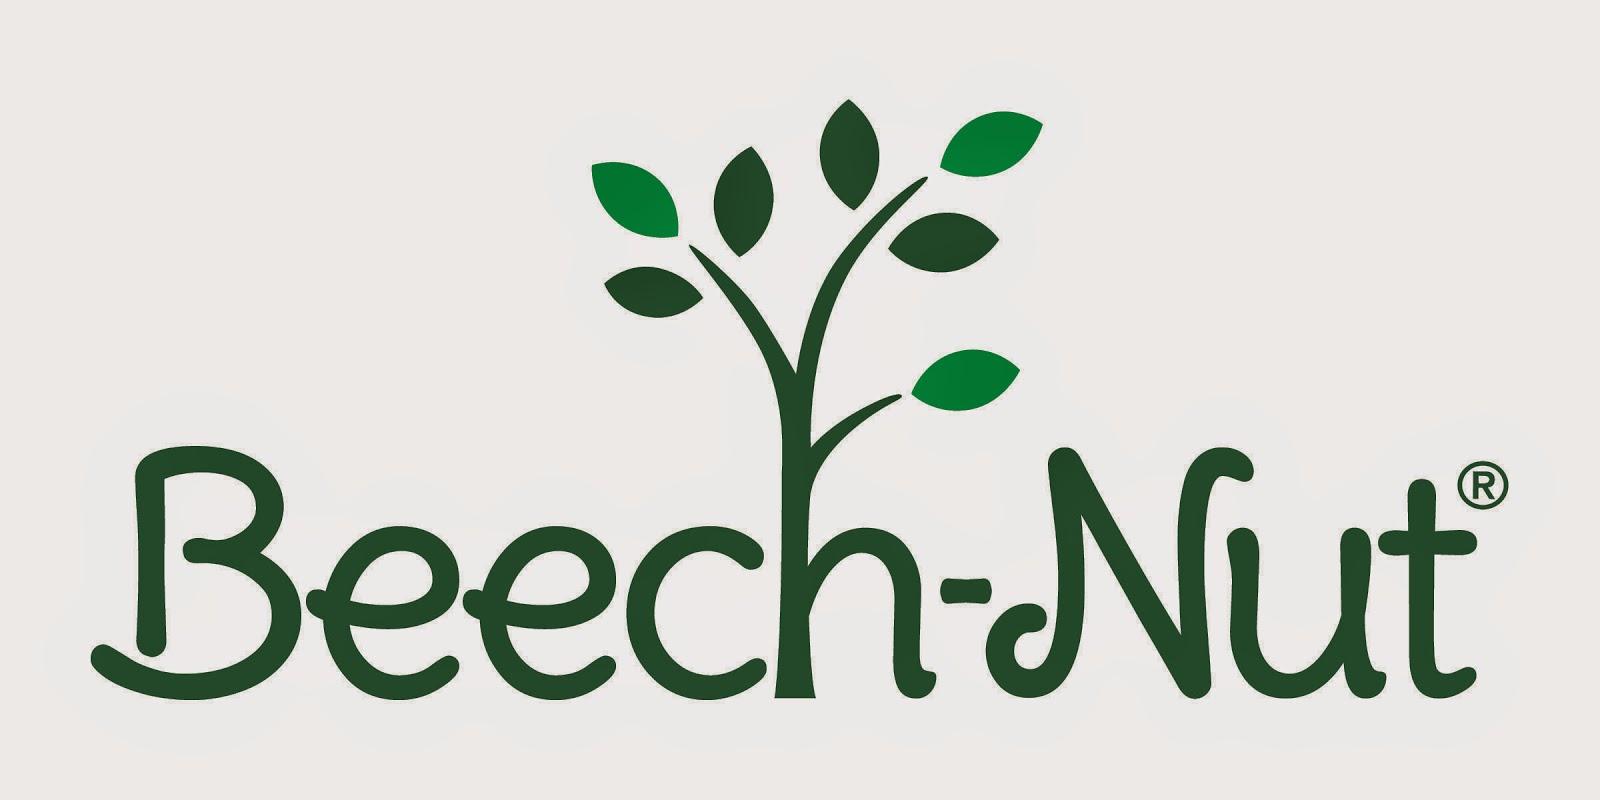 beech nut Beech ut (bēch′nŭt′) n the small, three-sided nut of a beech tree beechnut (ˈbiːtʃˌnʌt) n (plants) the small brown triangular edible nut of the beech tree see.